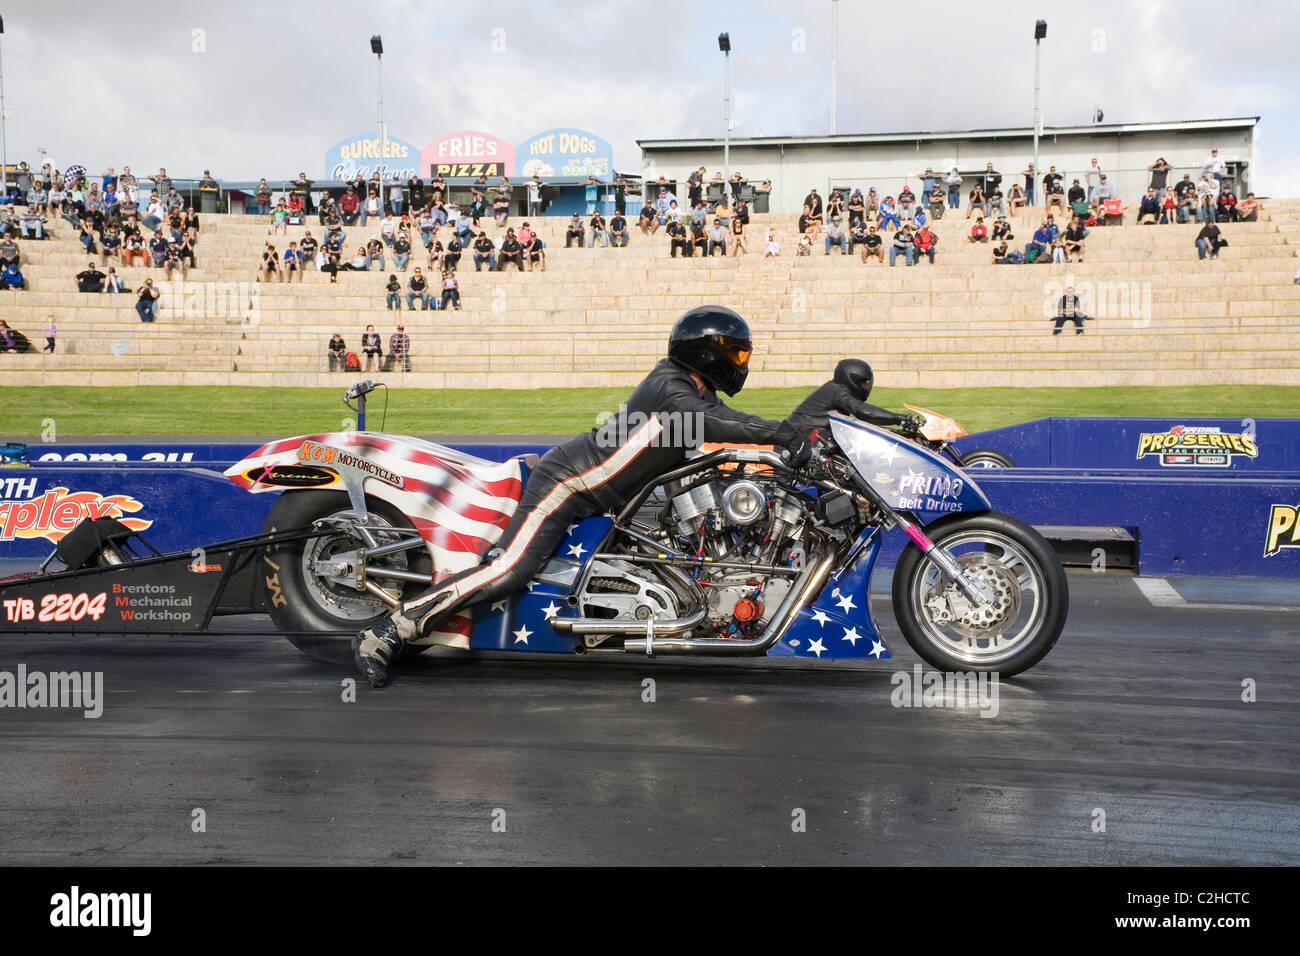 Australian Nitro Fuelled Harley Davidson Based Top Bike Drag